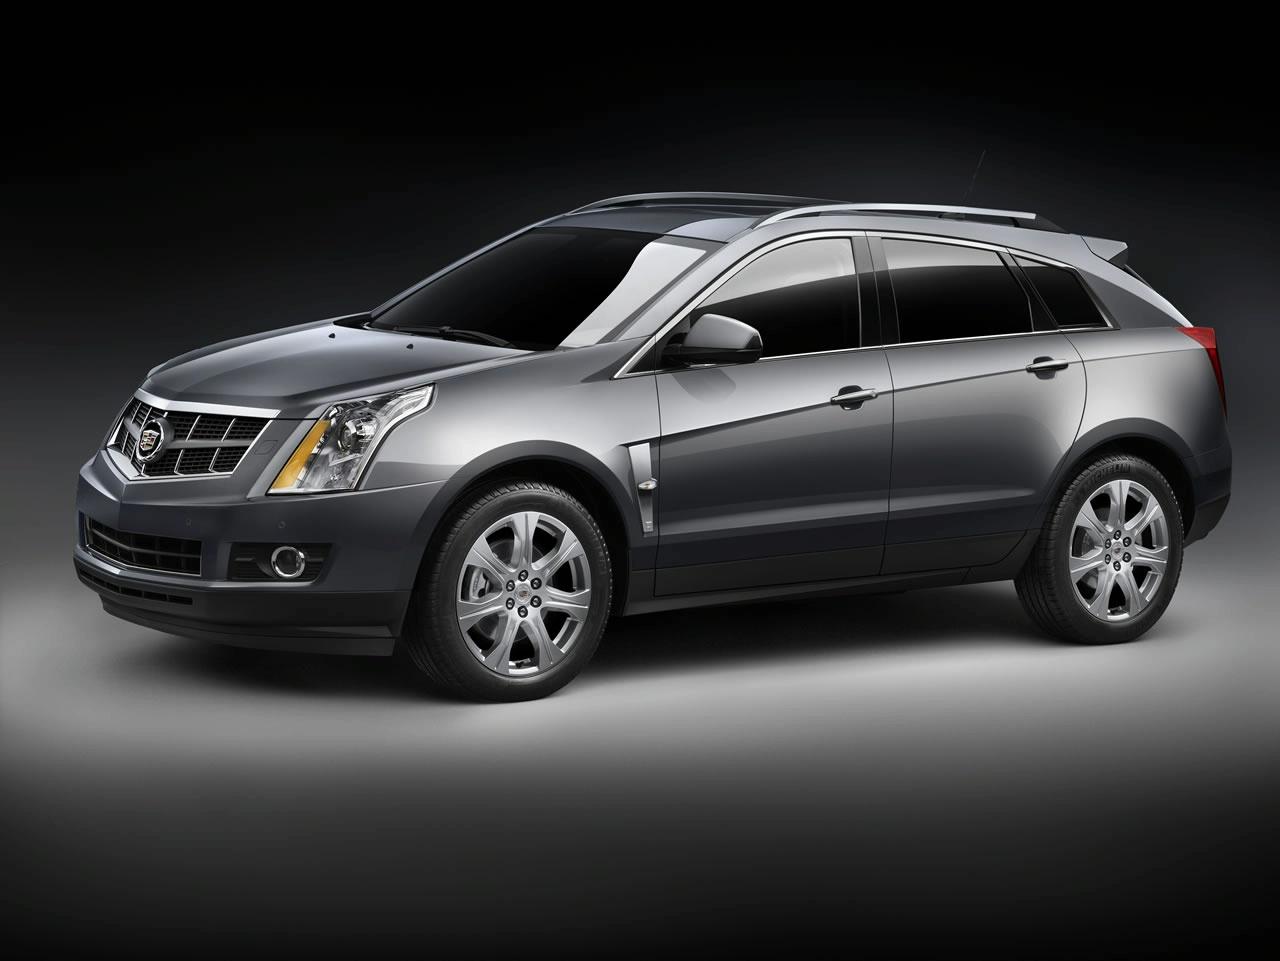 2010 Cadillac Srx Unveiled Autoevolution